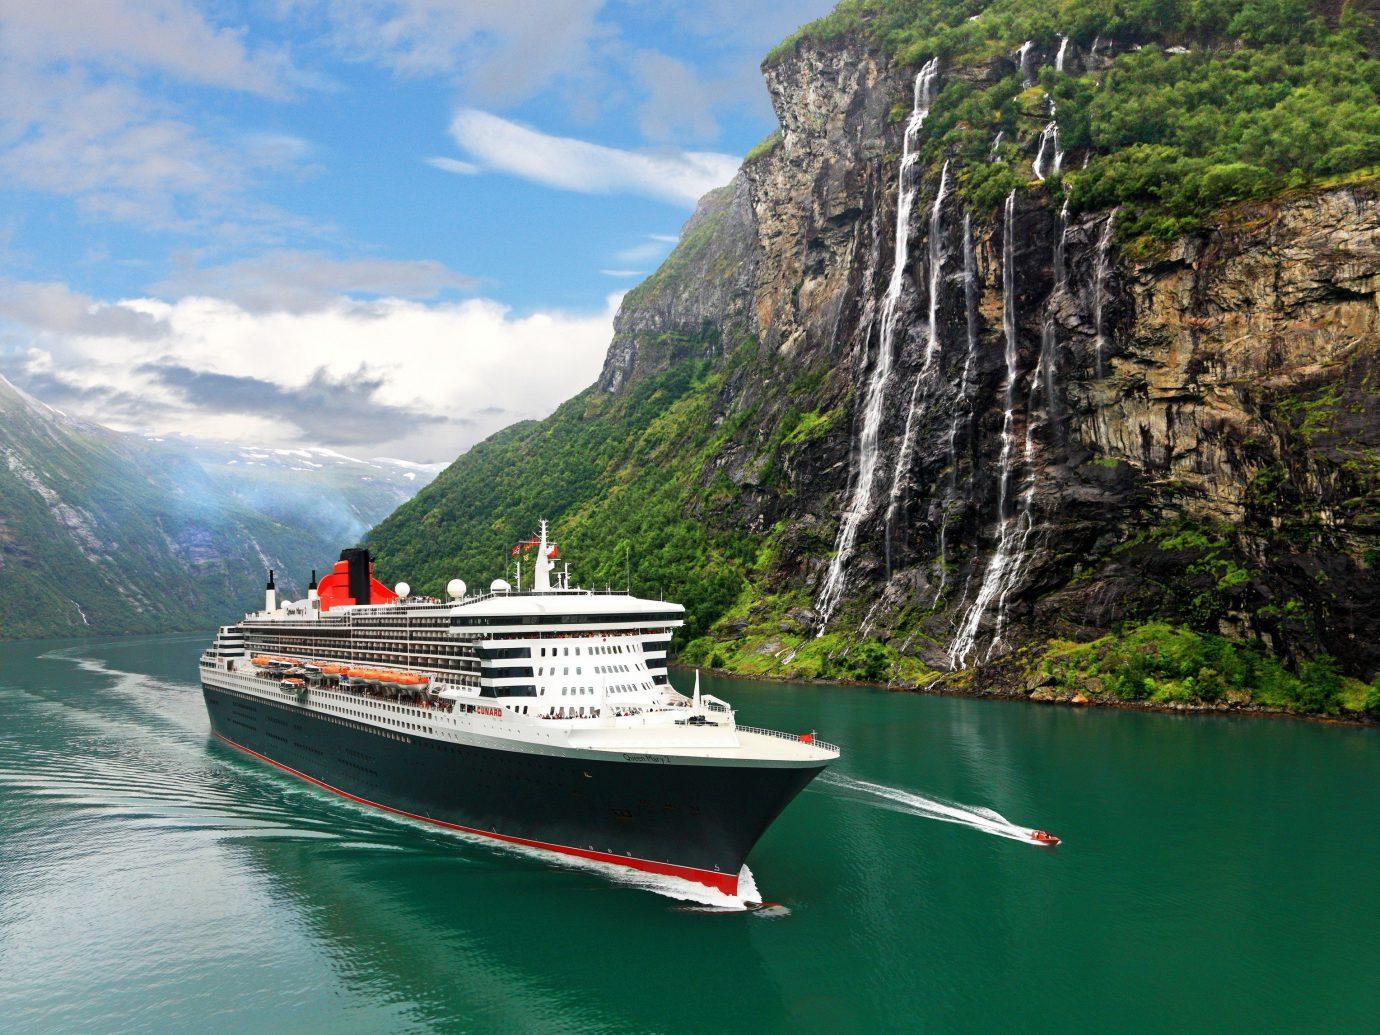 Trip Ideas water outdoor Boat mountain vehicle passenger ship fjord Sea ship cruise ship watercraft Coast bay boating